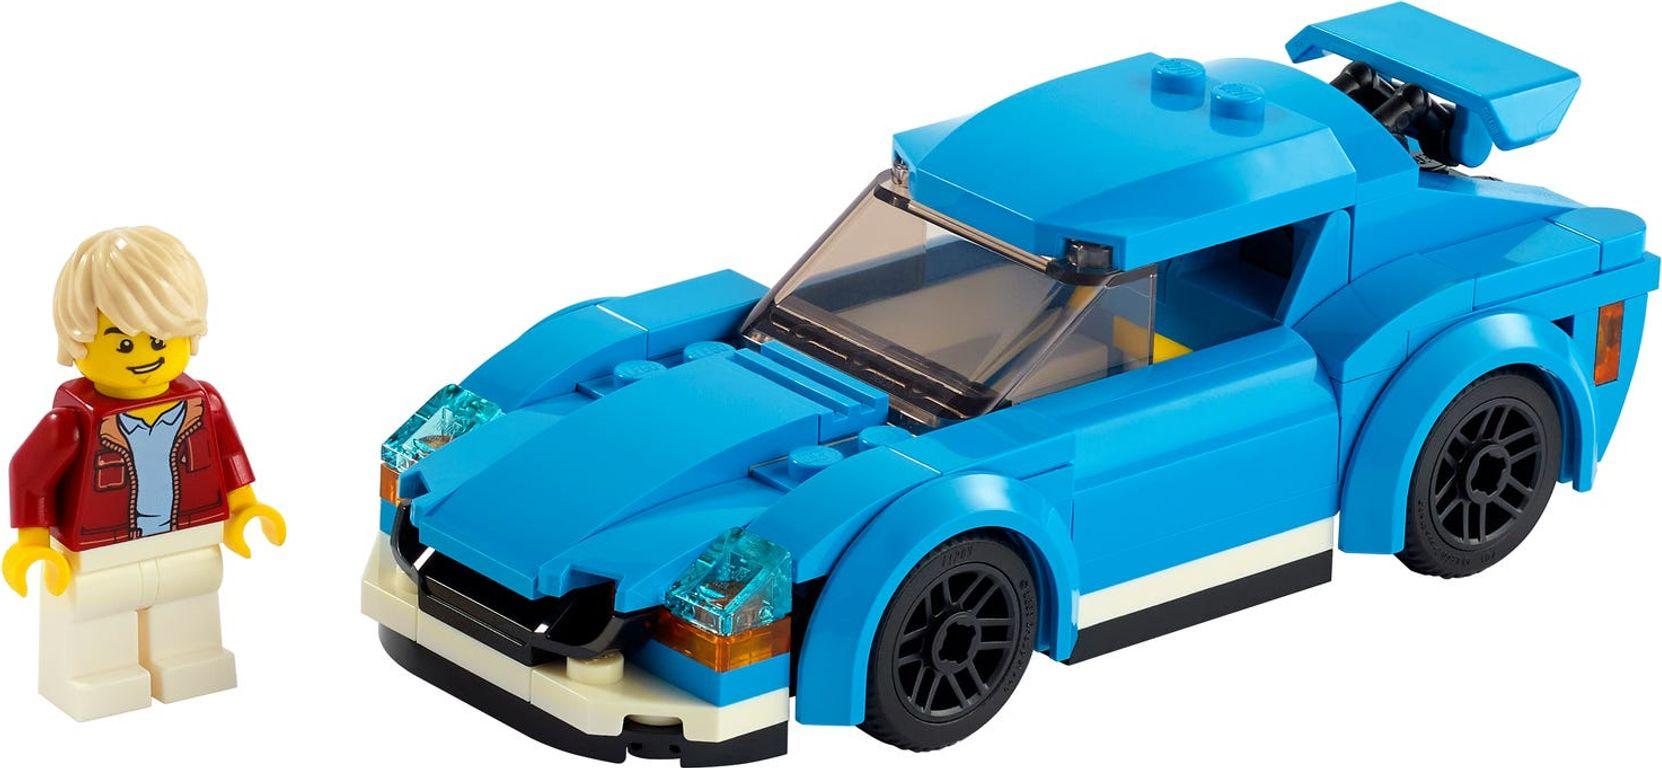 LEGO® City Sports Car components